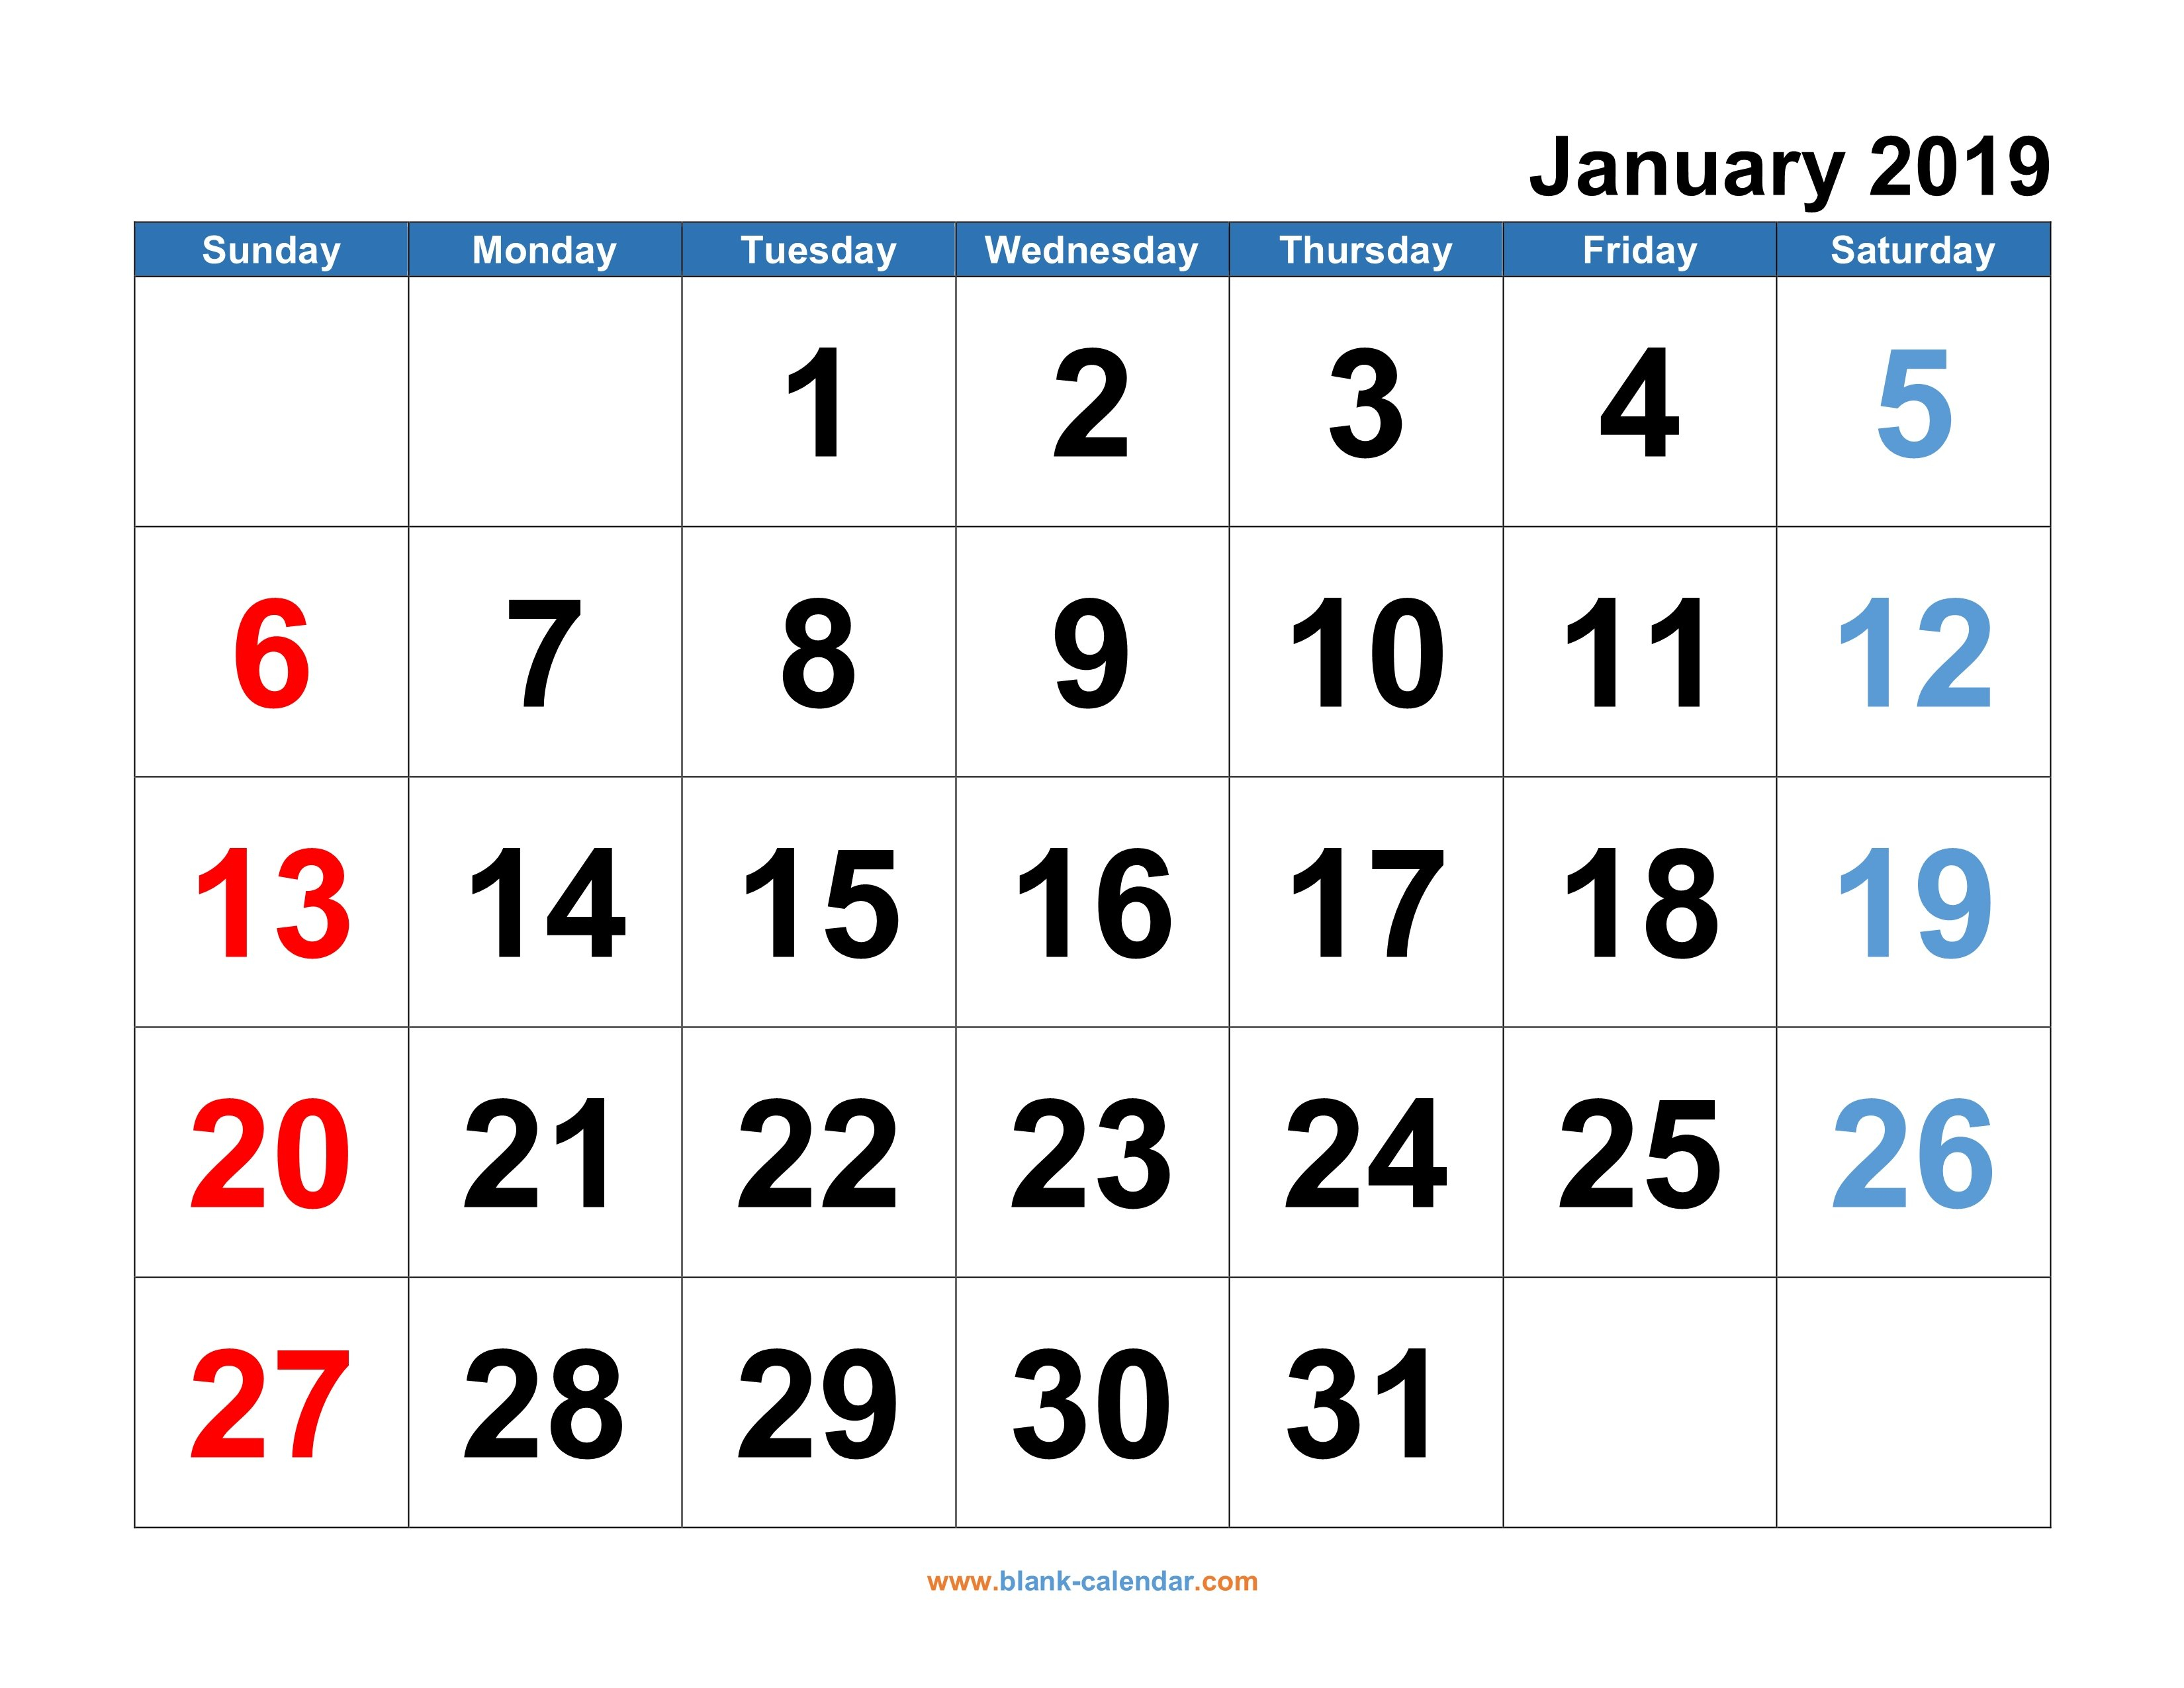 Monthly Calendar 2019 | Free Download, Editable And Printable Calendar 2019 Editable